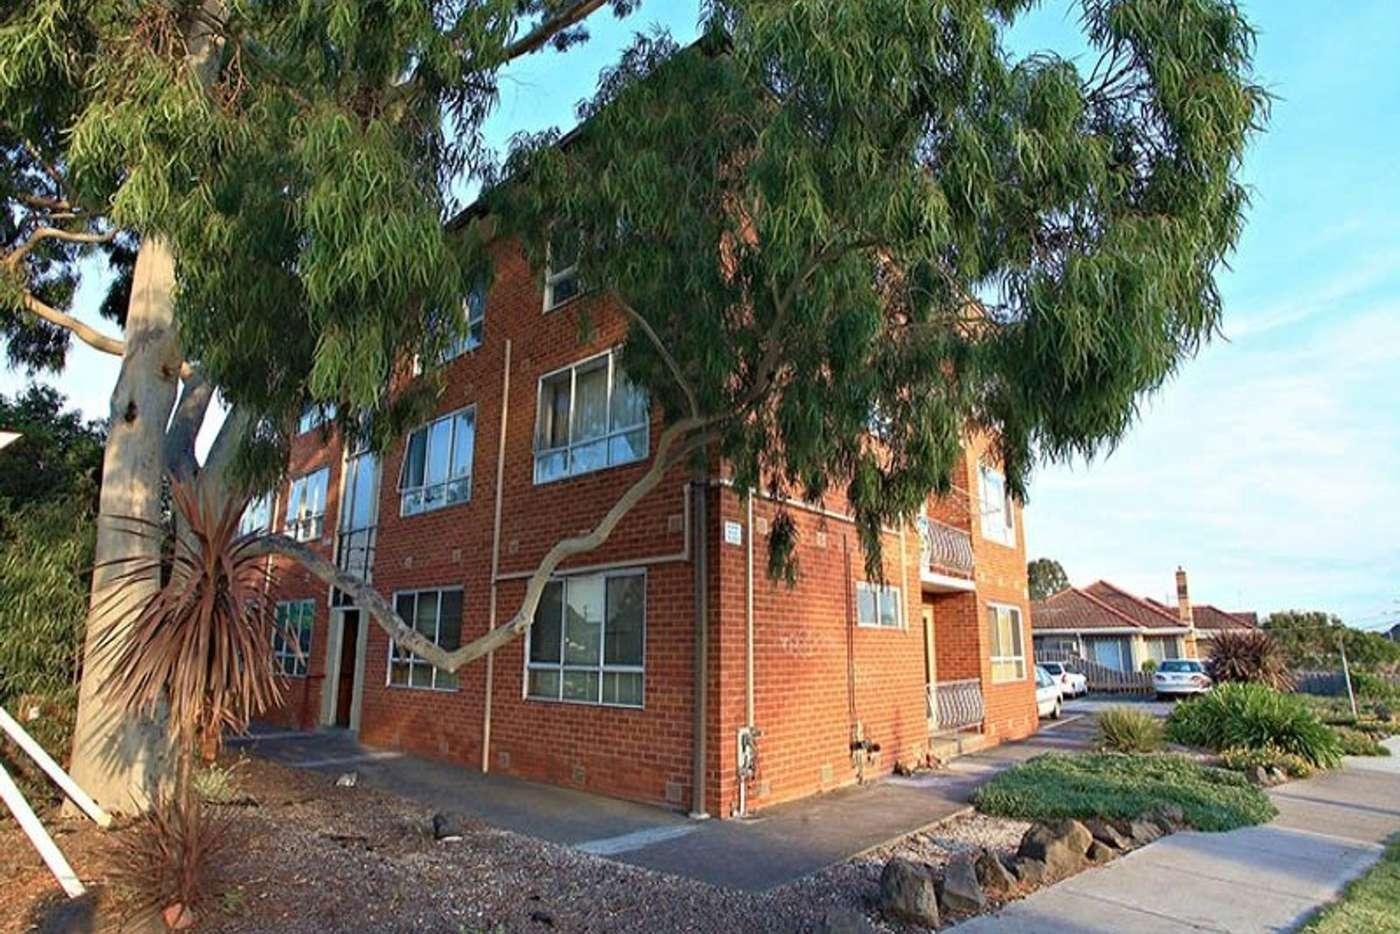 Main view of Homely apartment listing, 31/437 Ballarat Road, Sunshine VIC 3020